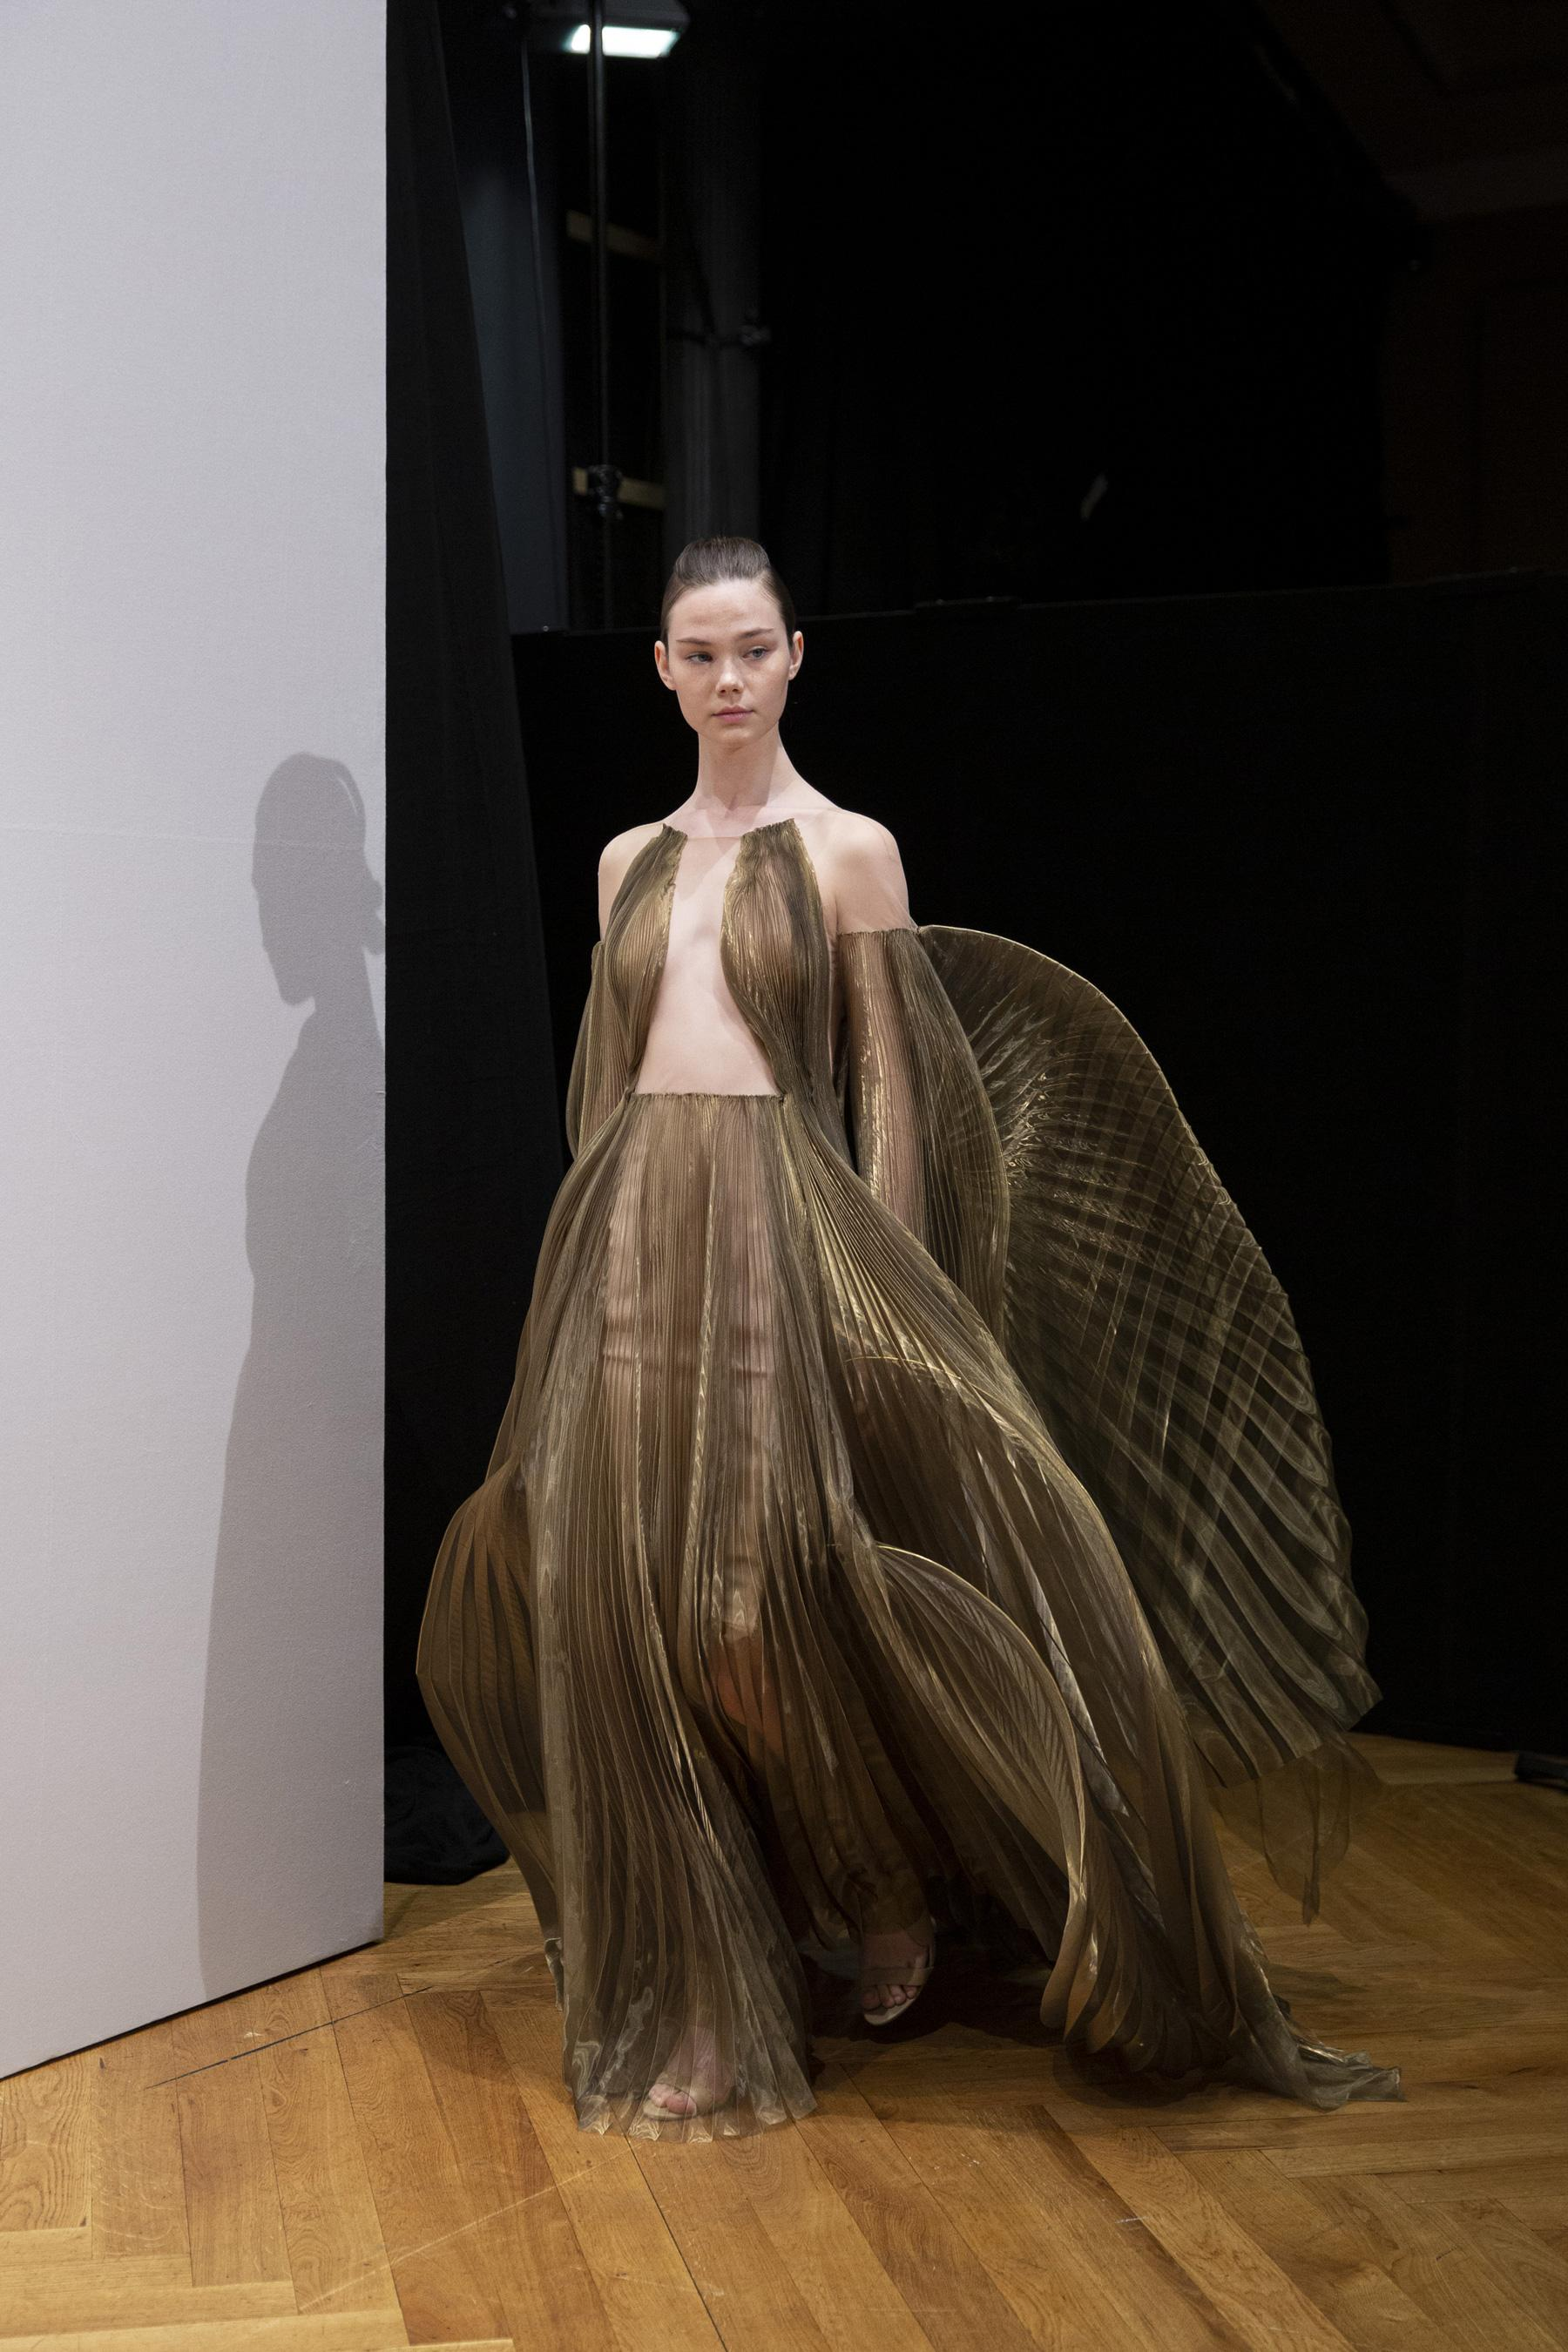 2019 Van Automne Hiver Figaro Iris 2020 Couture Herpen Madame Défilé SpqVGzMLUj